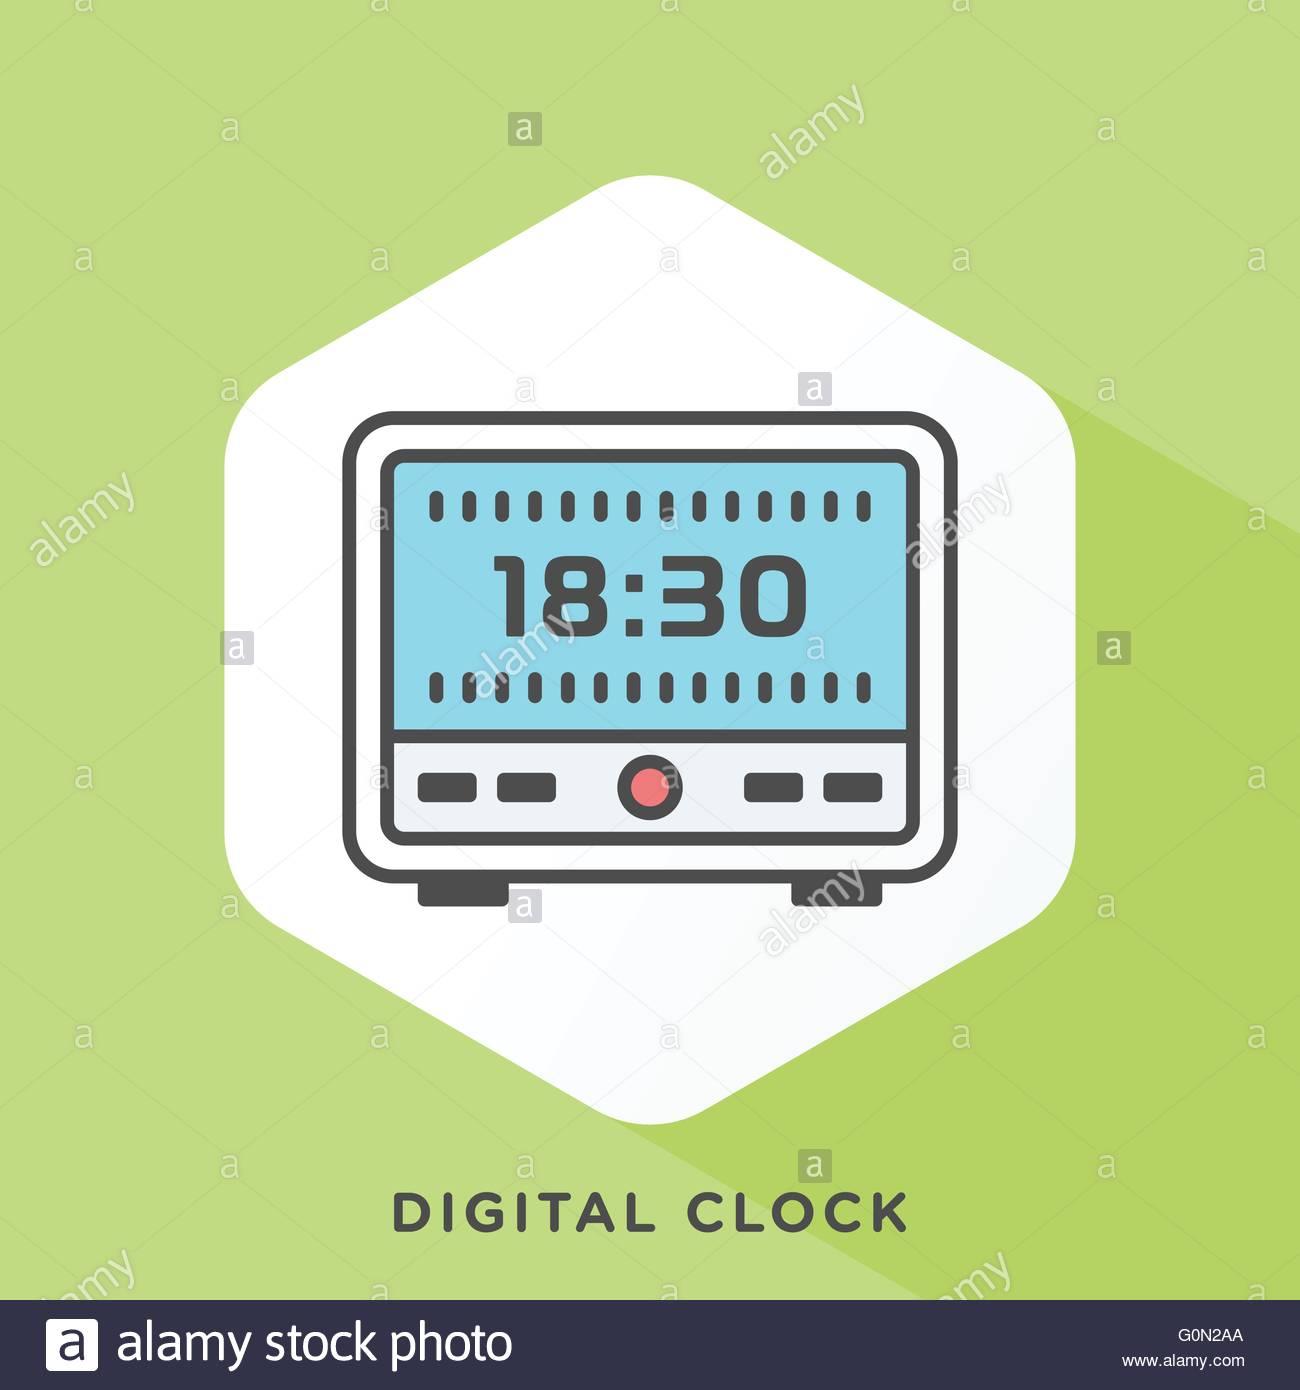 modern style minimalistic vector illustration for alarm clocks to  - modern style minimalistic vector illustration for alarm clocks to wake upright away